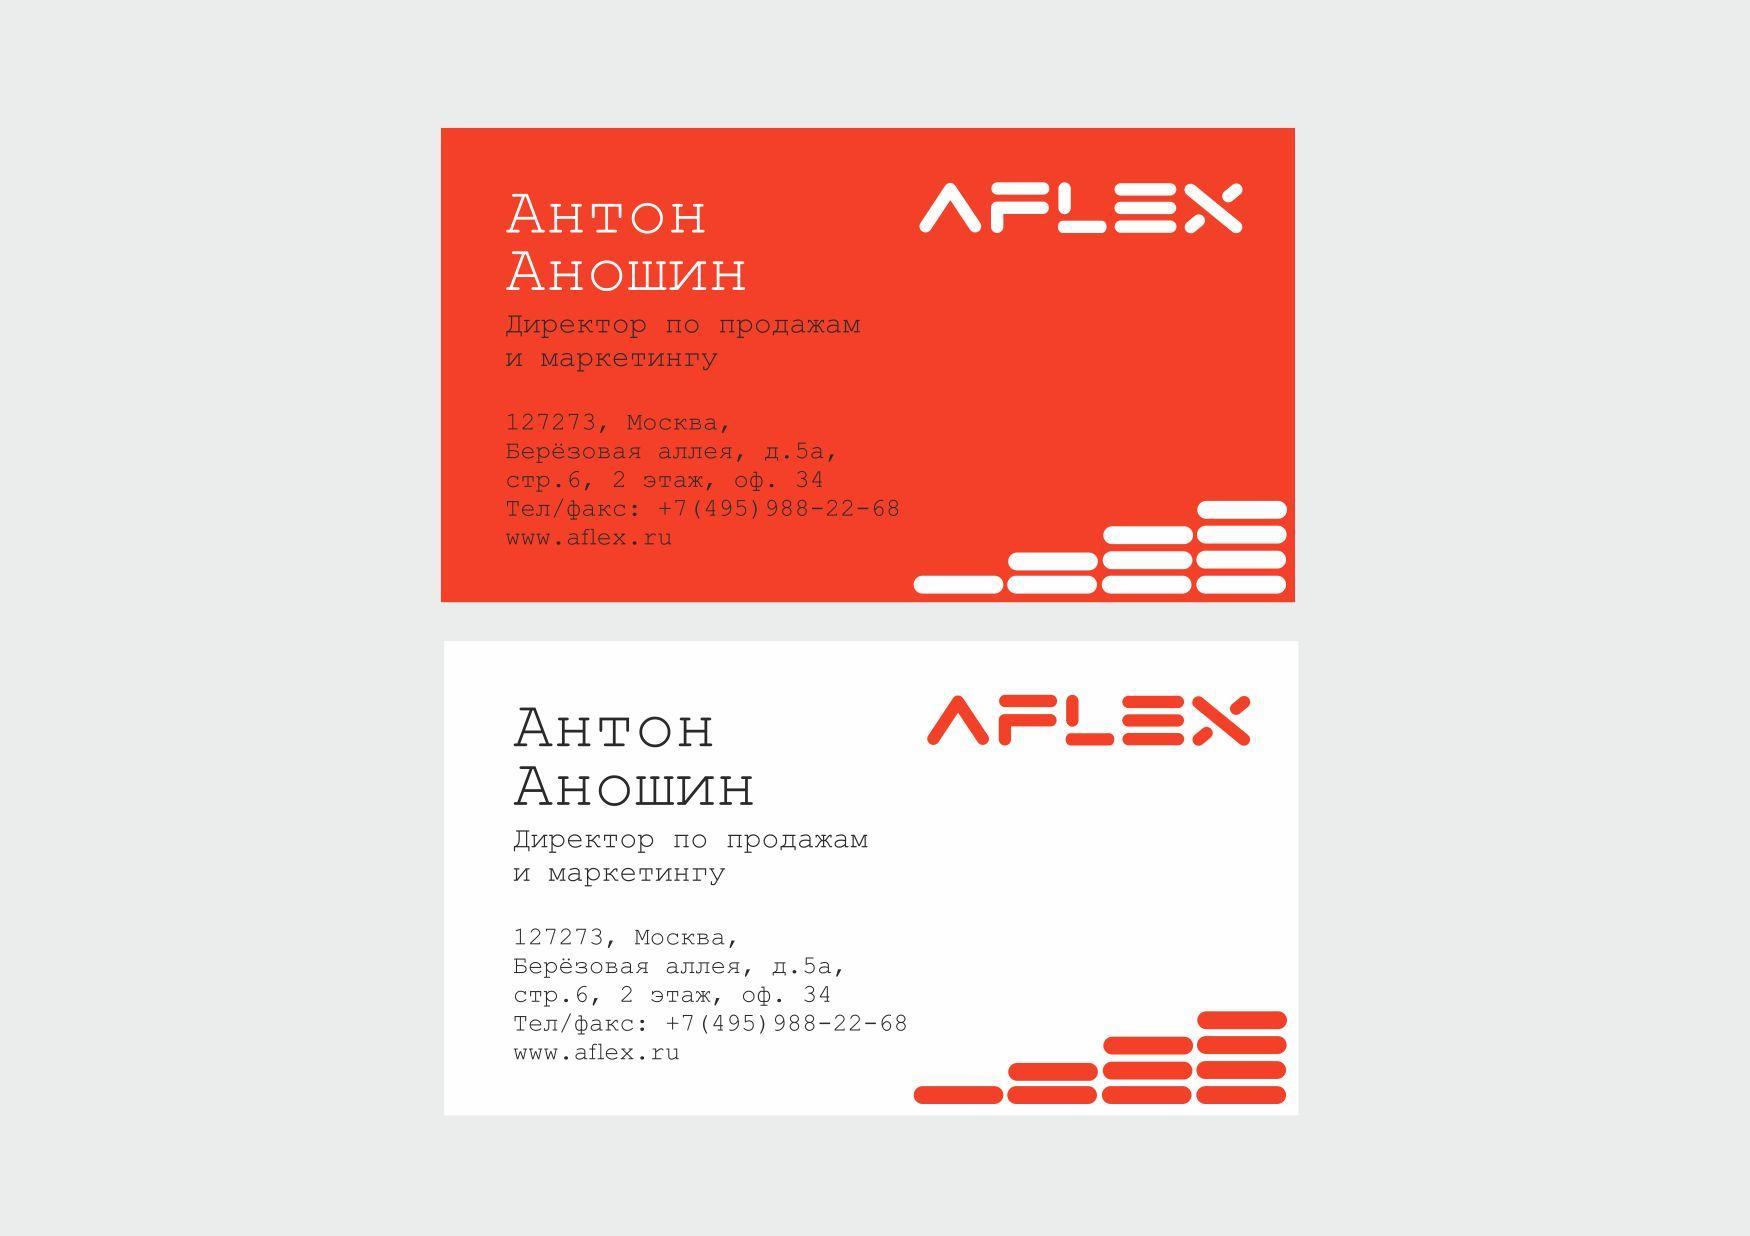 AFLEX-6